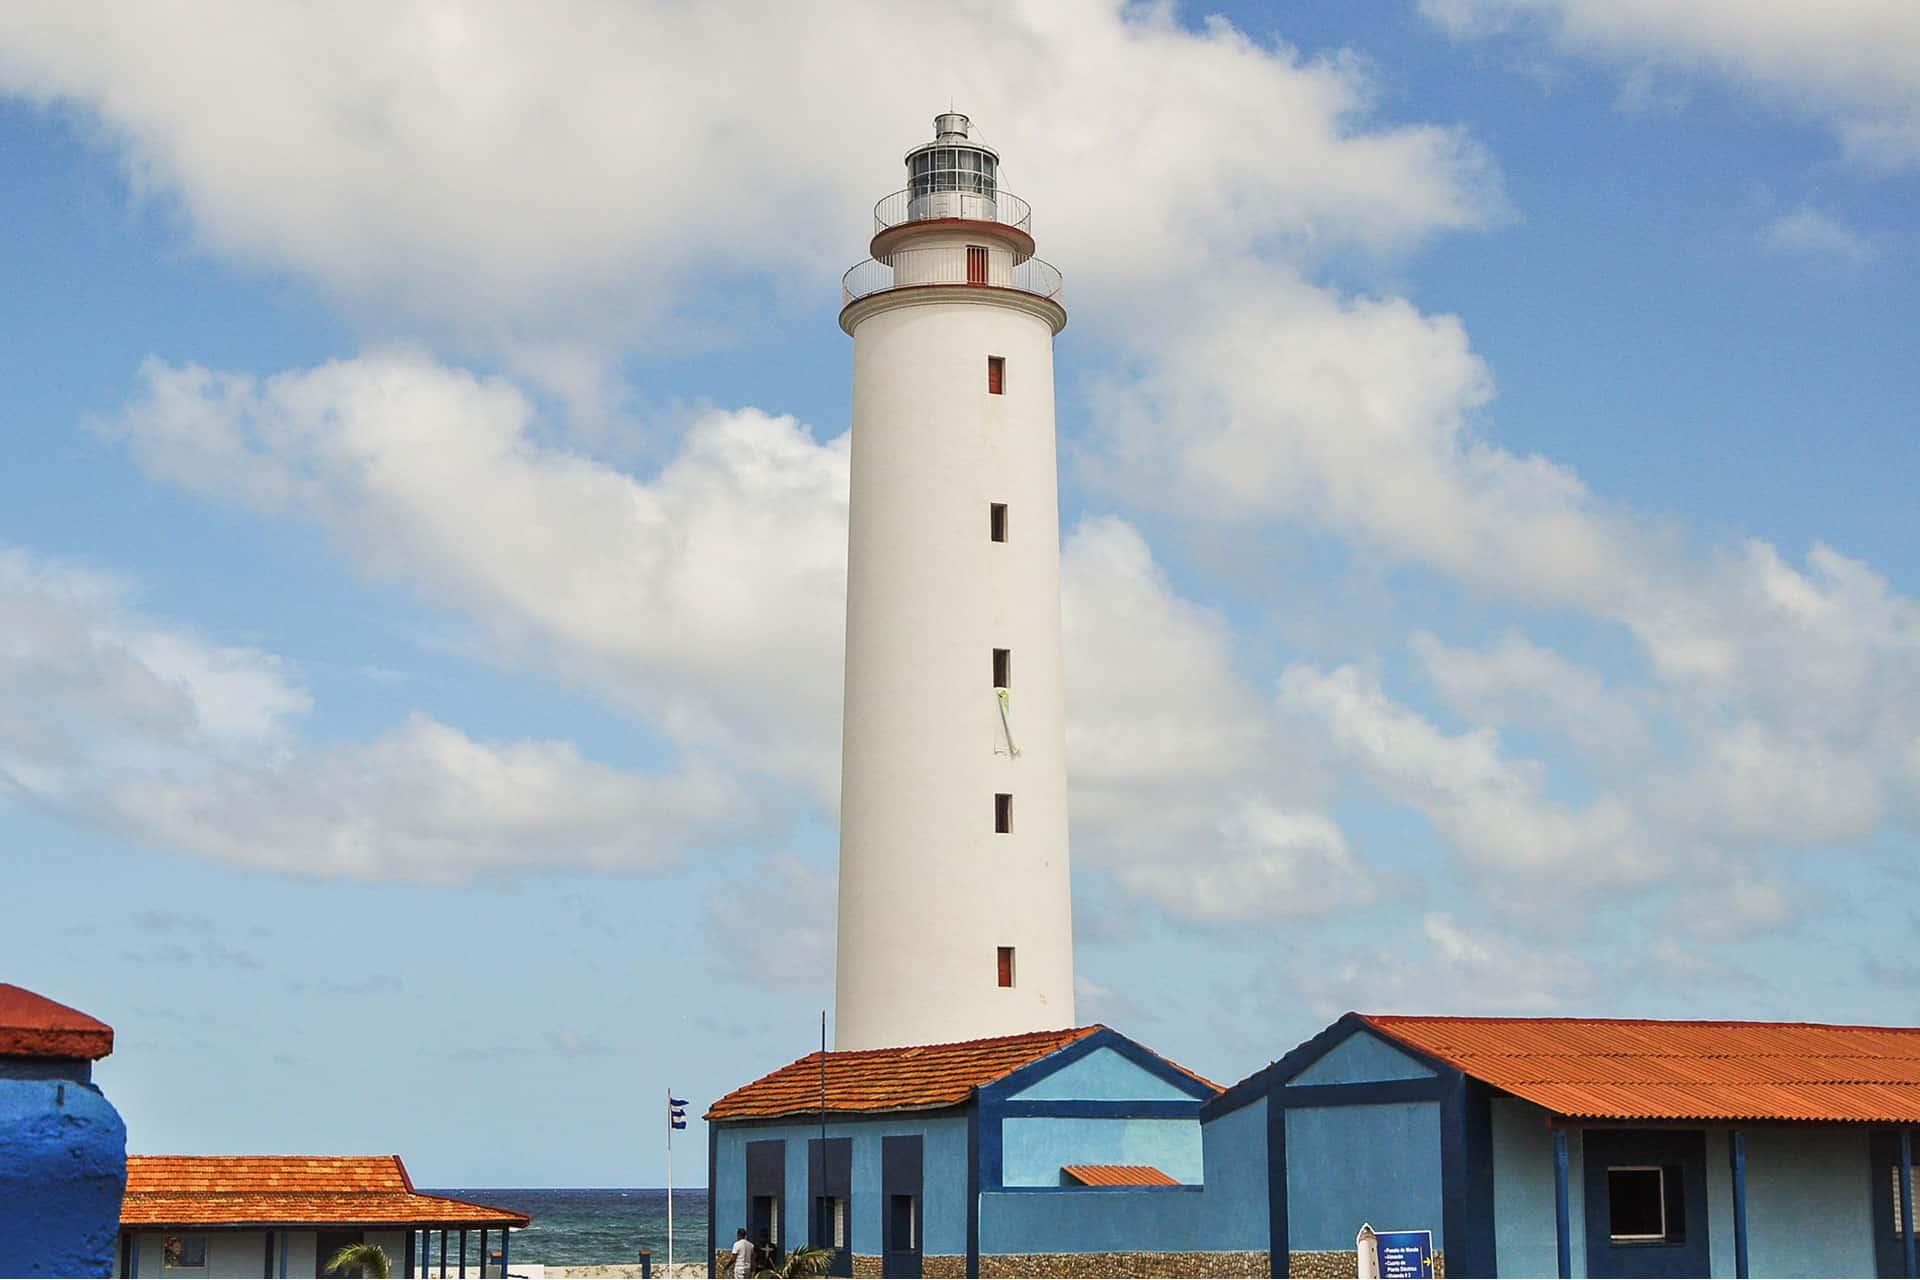 baracoa phare yunque cuba autrement